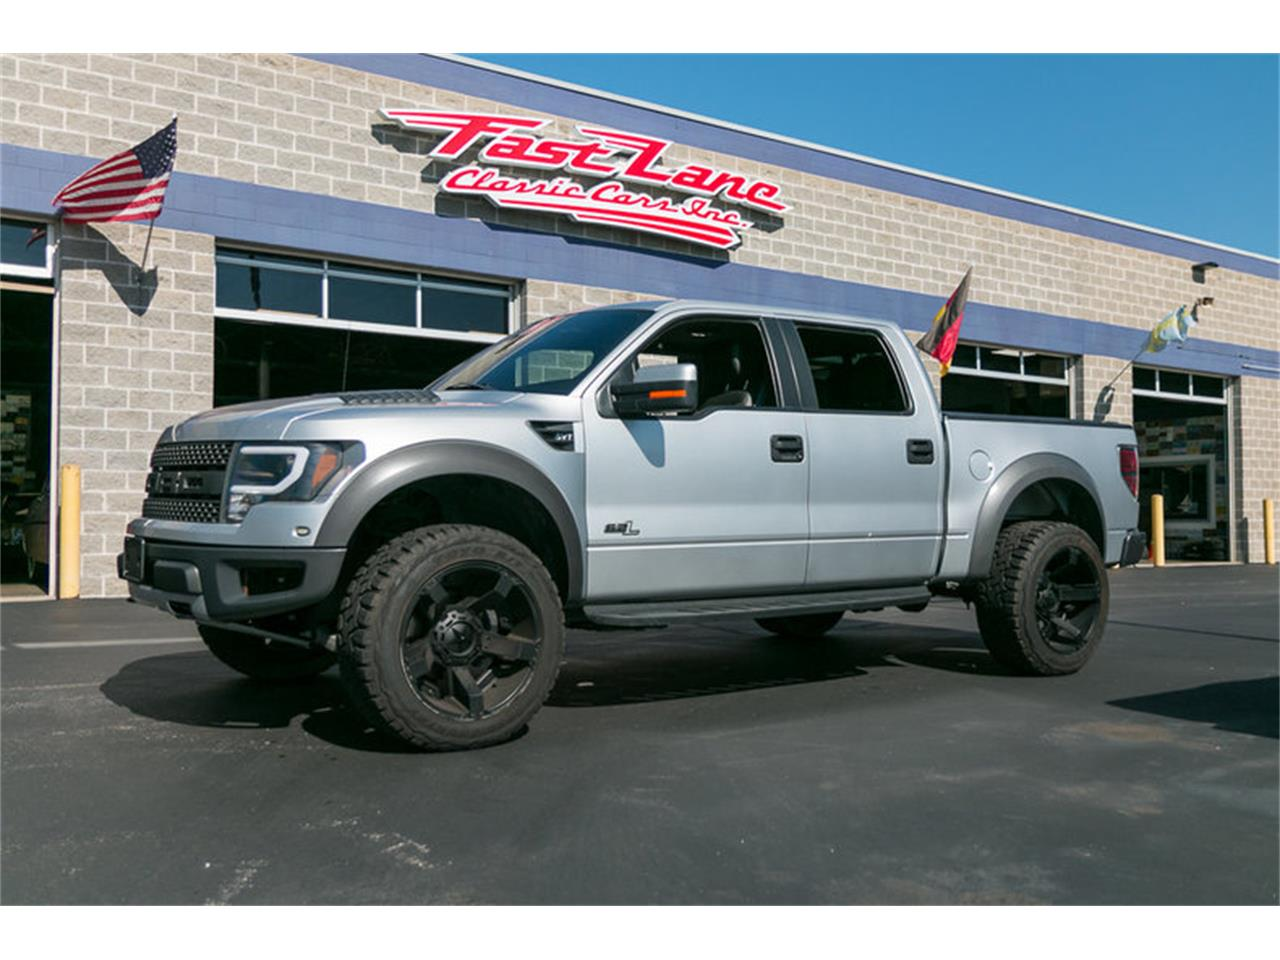 2012 Ford Raptor For Sale >> For Sale 2012 Ford Raptor In St Charles Missouri